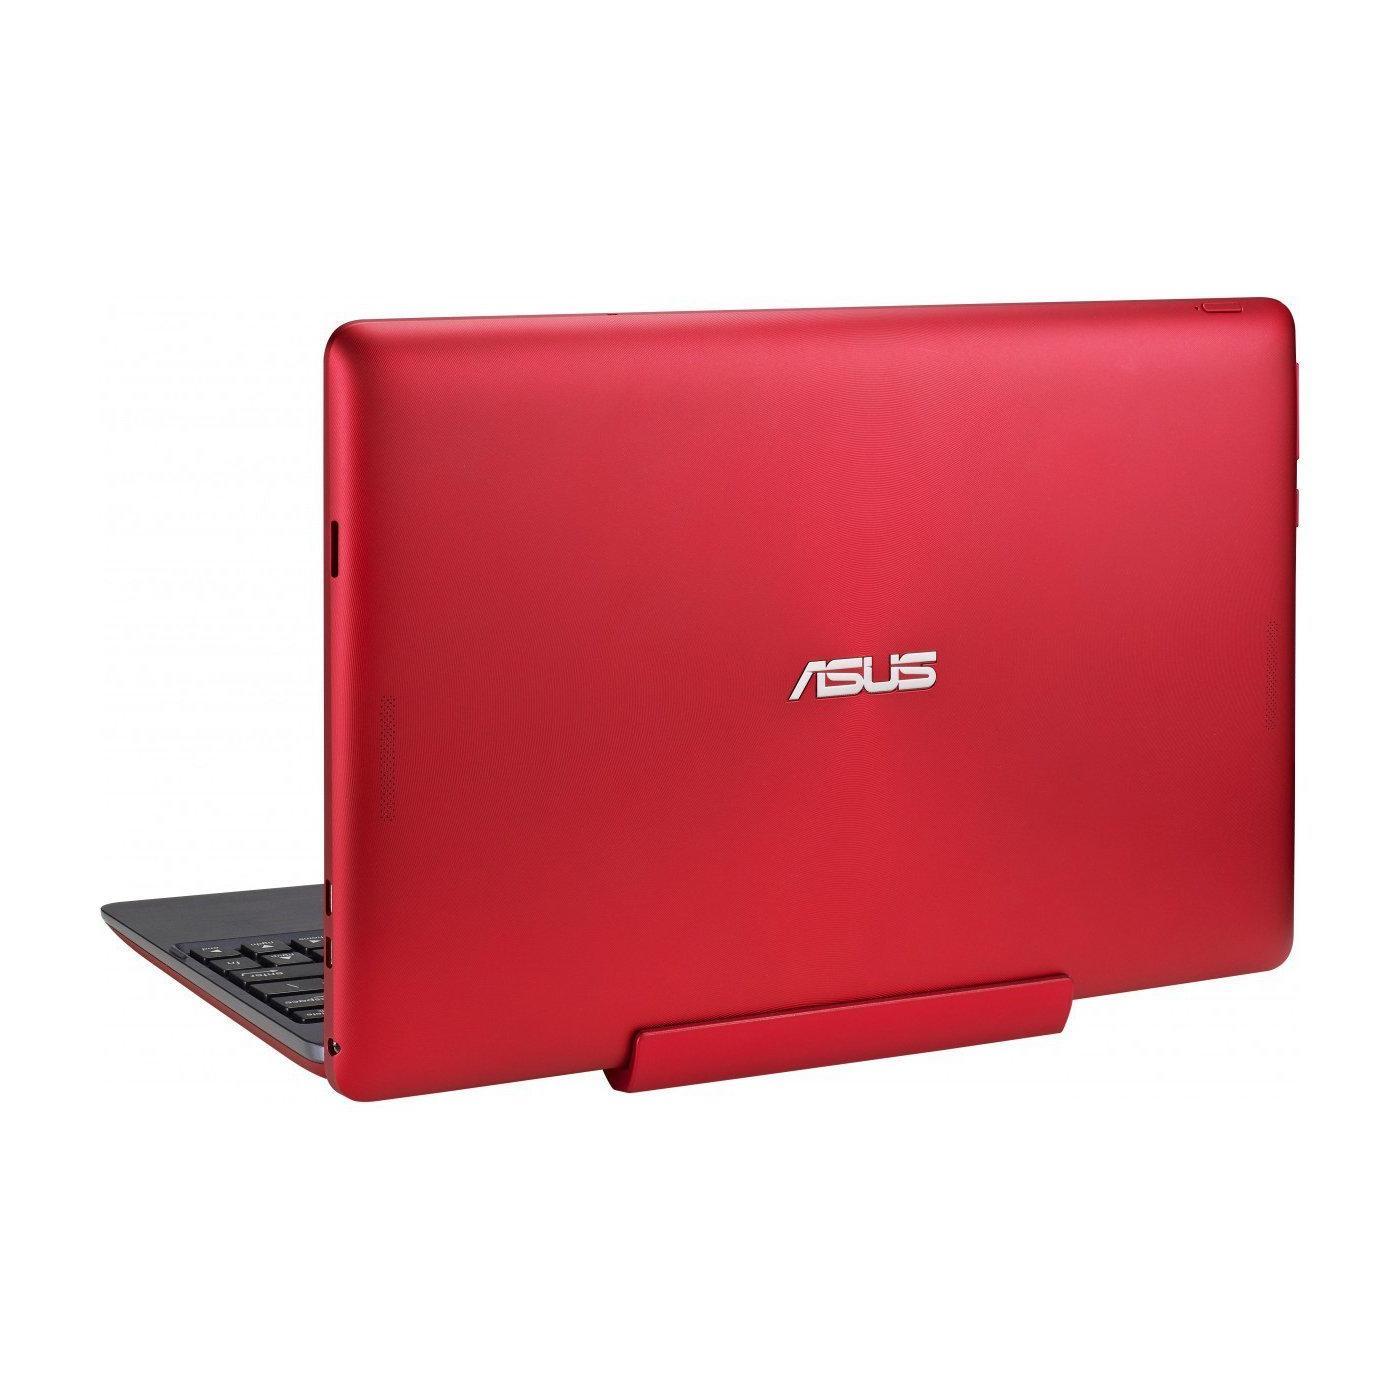 "Asus T100TAF-BING-DK037B 10,1"" Atom Z3735F 1.83 GHz  - HDD 32 GB - RAM 2 GB"